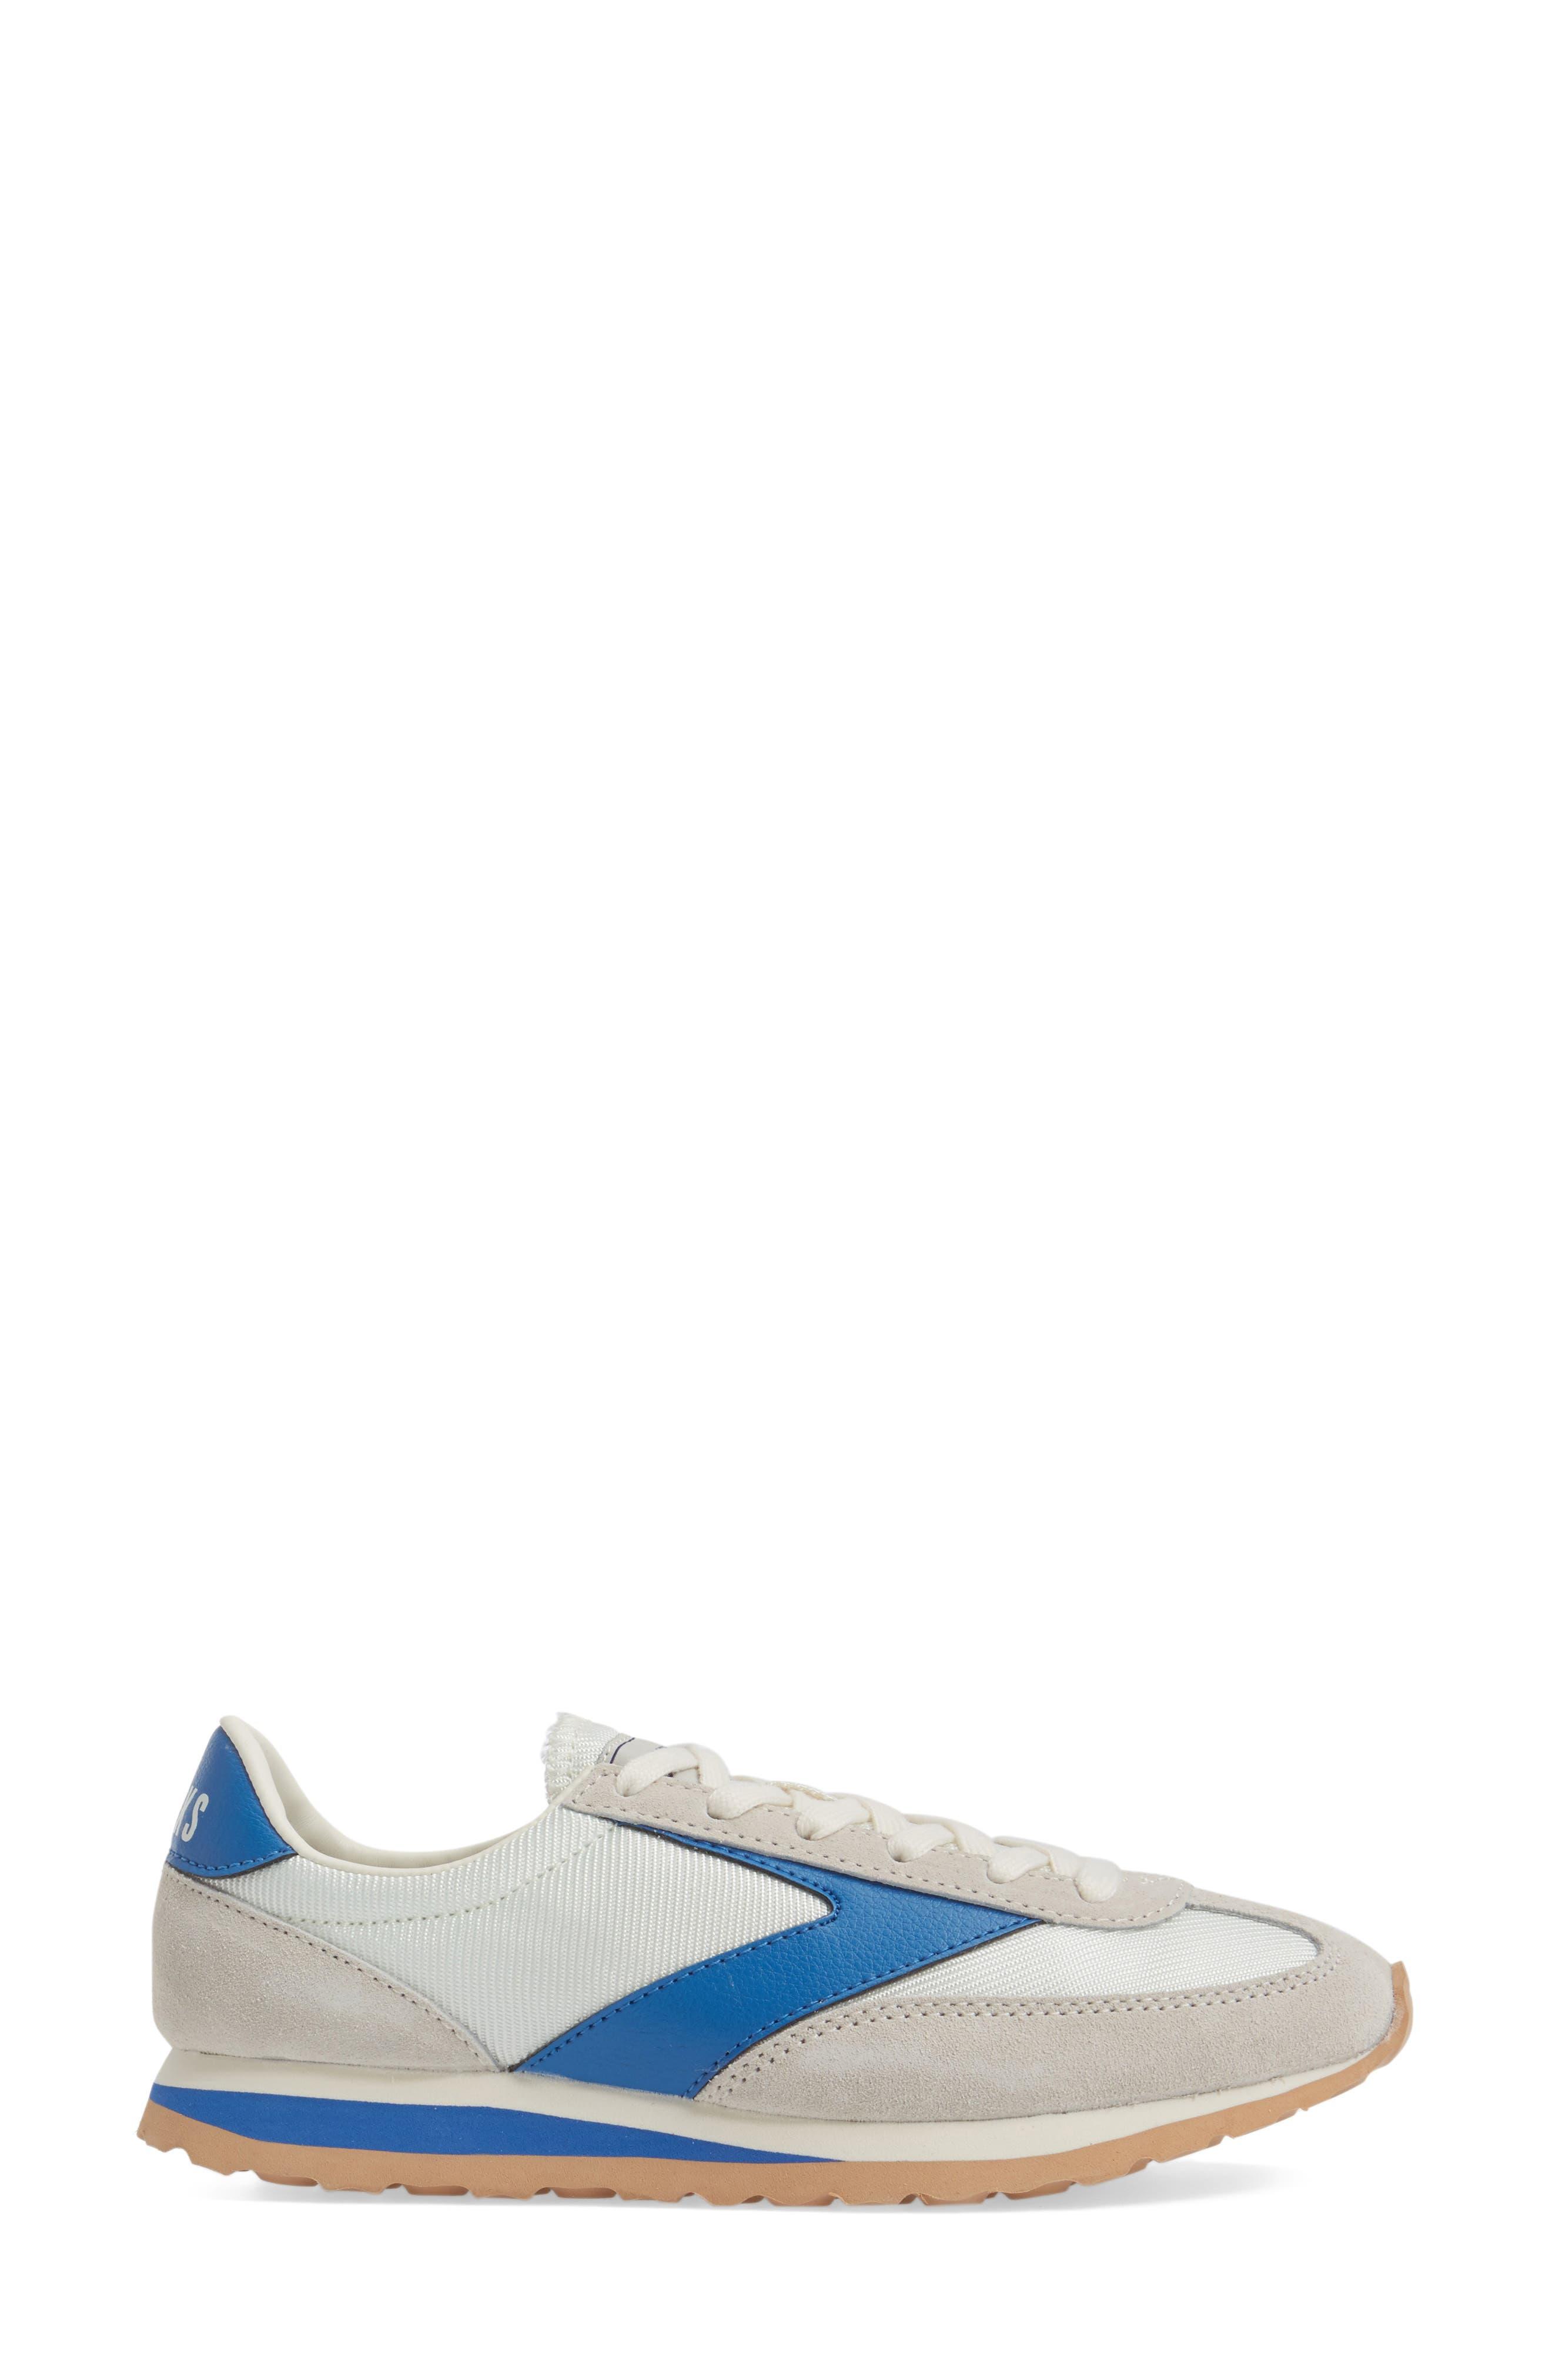 'Vanguard' Sneaker,                             Alternate thumbnail 106, color,